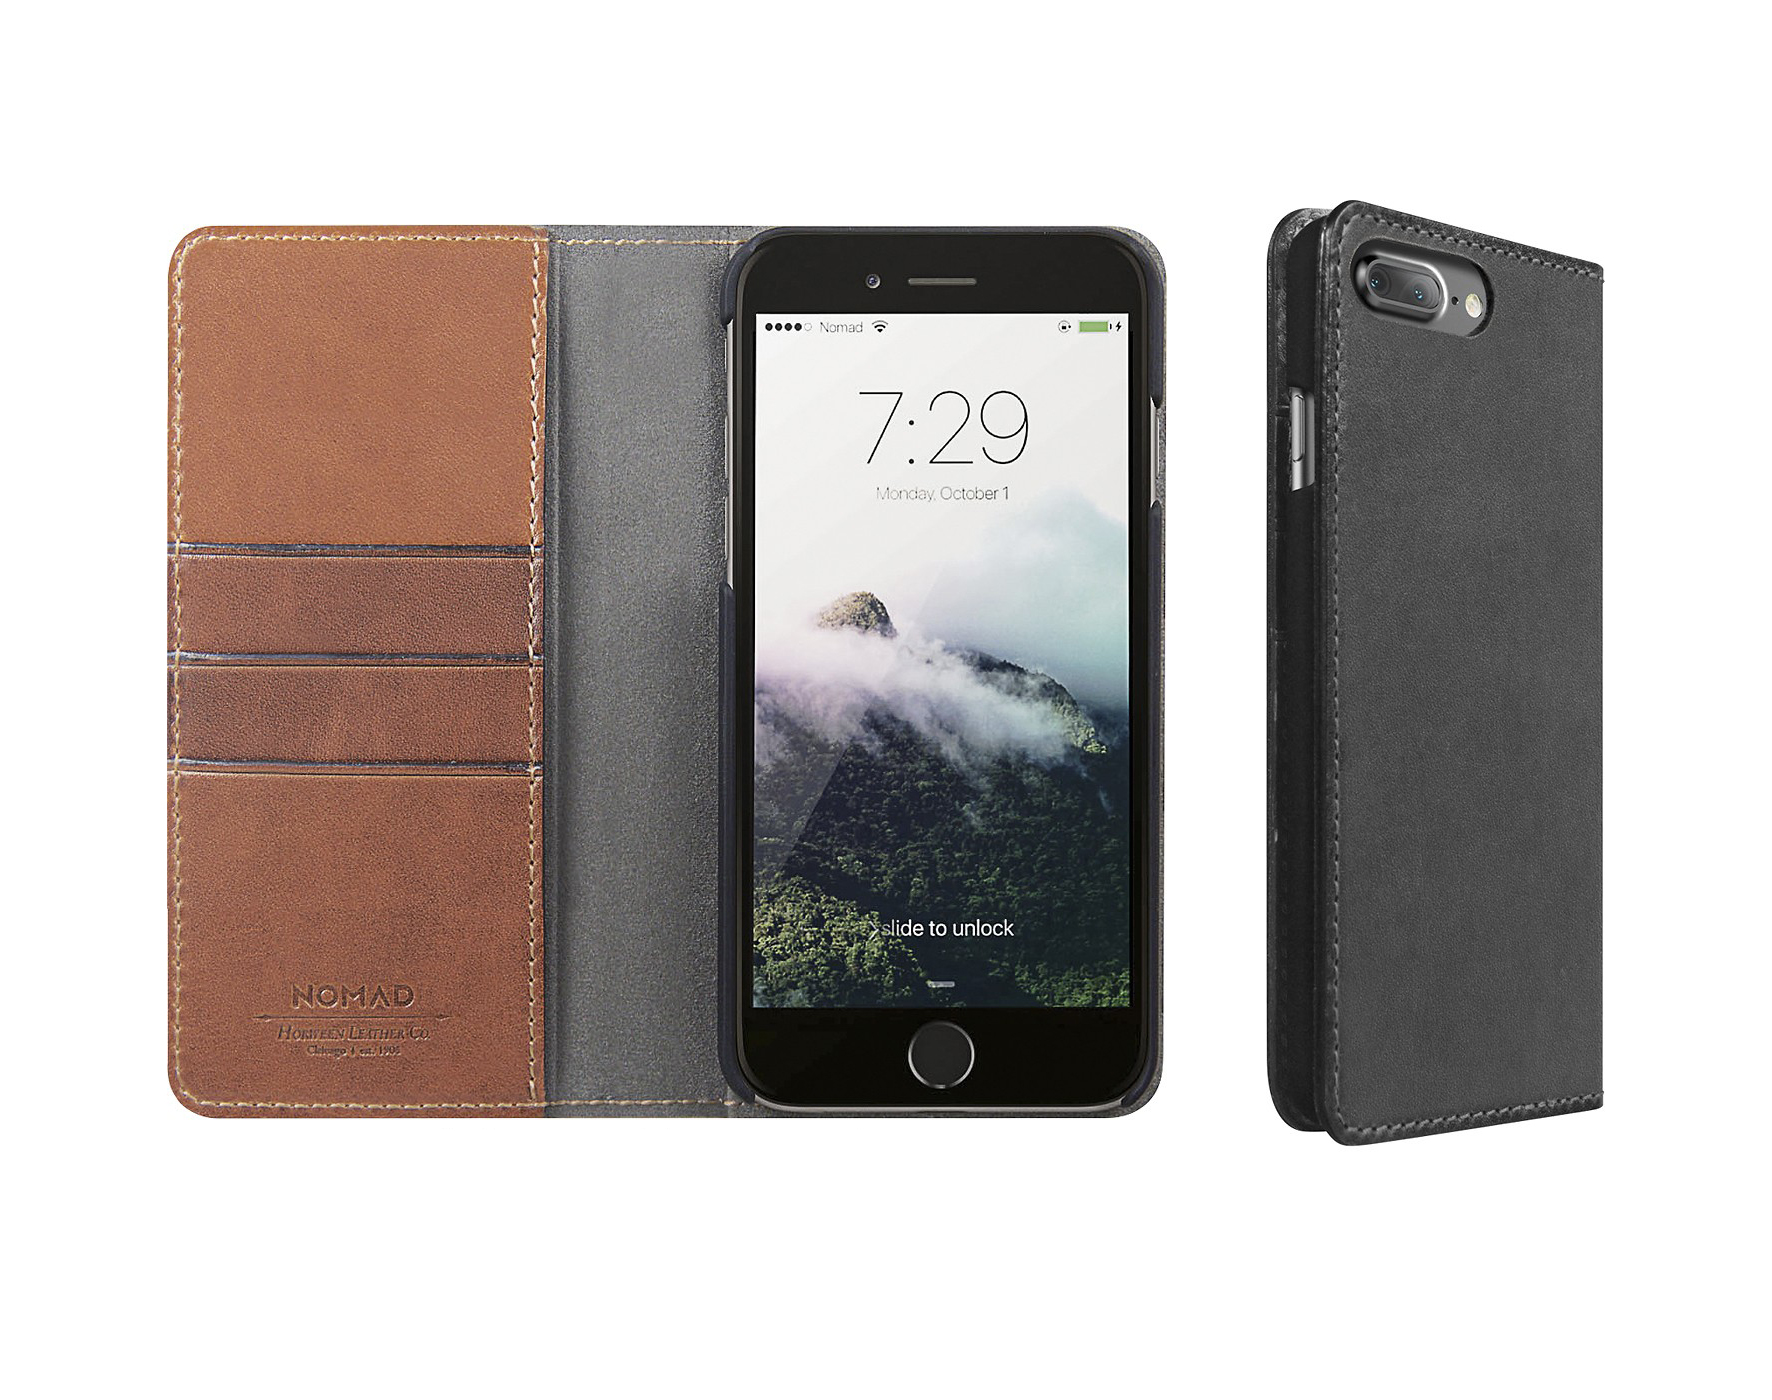 nomad-leather-folio-wallet-case-iphone-7-plus.jpg